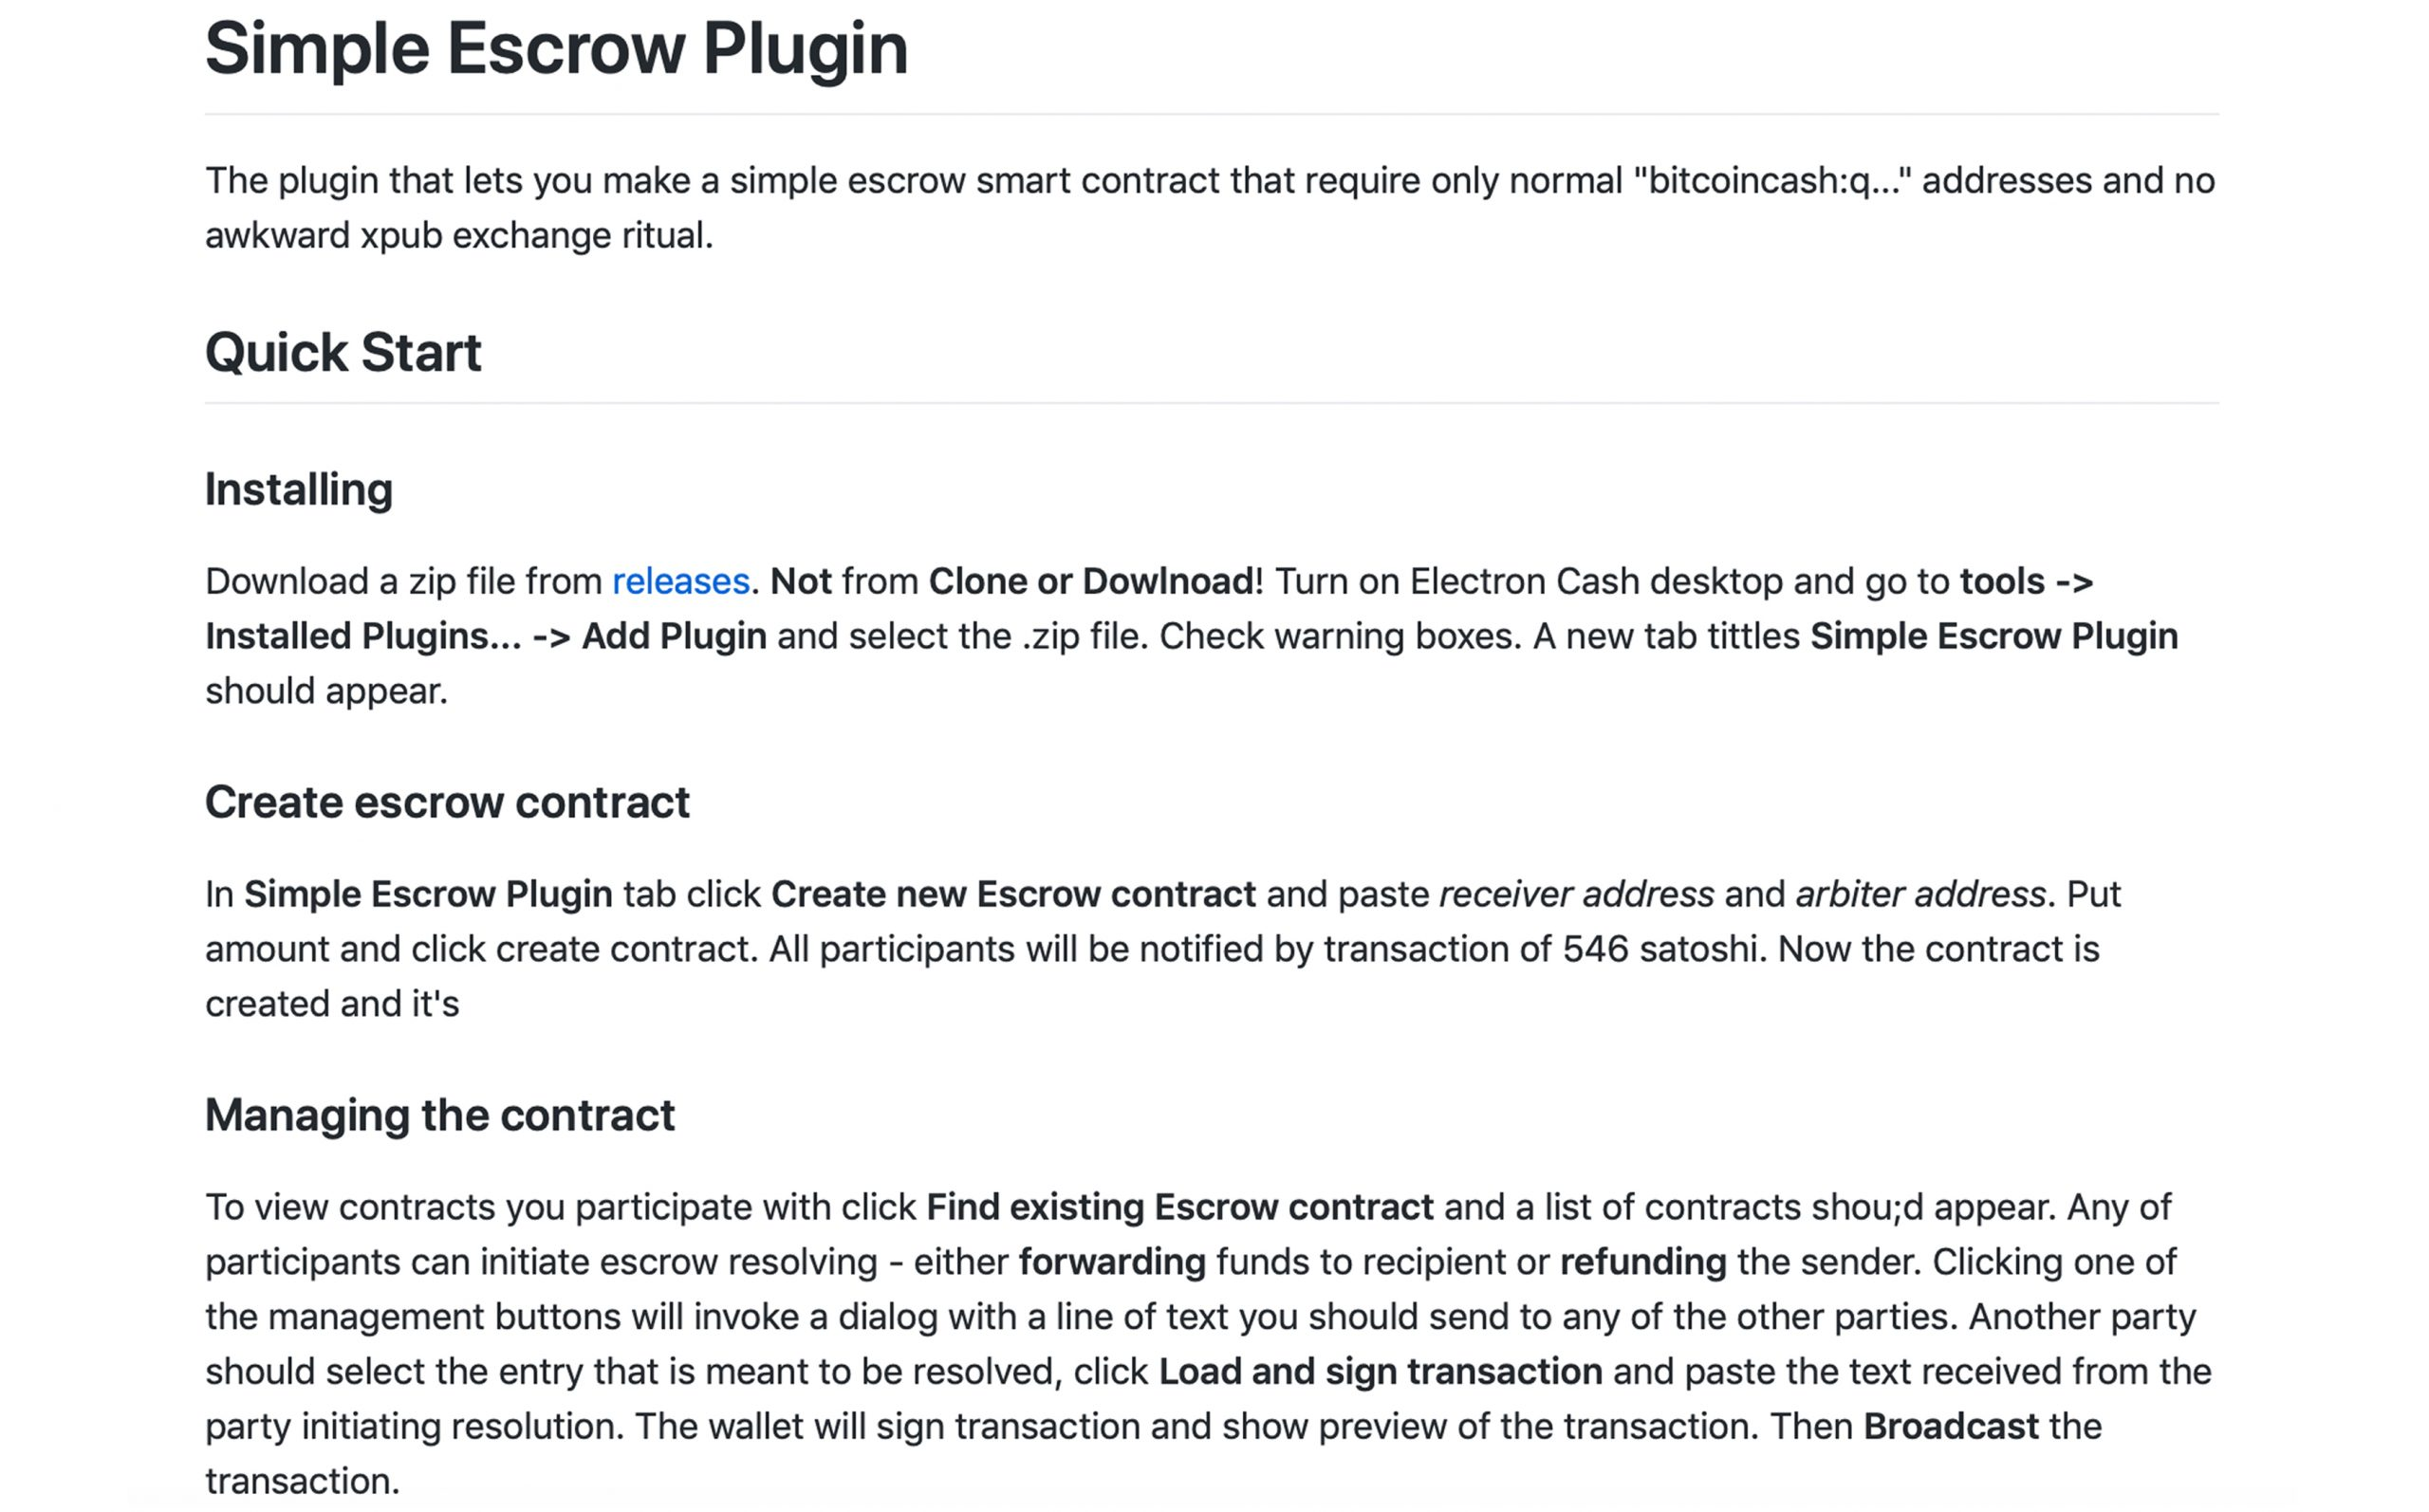 "Aprovechando canales de efectivo y Efectivo de igual a igual ""width ="" 562 ""height ="" 350 ""srcset ="" https://blackswanfinances.com/wp-content/uploads/2019/11/plug-scaled.jpg 2560w, https: / /news.bitcoin.com/wp-content/uploads/2019/11/plug-300x187.jpg 300w, https://news.bitcoin.com/wp-content/uploads/2019/11/plug-1024x637.jpg 1024w , https://news.bitcoin.com/wp-content/uploads/2019/11/plug-768x478.jpg 768w, https://news.bitcoin.com/wp-content/uploads/2019/11/plug- 1536x956.jpg 1536w, https://news.bitcoin.com/wp-content/uploads/2019/11/plug-2048x1275.jpg 2048w, https://news.bitcoin.com/wp-content/uploads/2019/ 11 / plug-696x433.jpg 696w, https://news.bitcoin.com/wp-content/uploads/2019/11/plug-1392x867.jpg 1392w, https://news.bitcoin.com/wp-content/ cargas / 2019/11 / plug-1 068x665.jpg 1068w, https://news.bitcoin.com/wp-content/uploads/2019/11/plug-675x420.jpg 675w, https://news.bitcoin.com/wp-content/uploads/2019/ 11 / plug-1920x1195.jpg 1920w ""tamaños ="" (ancho máximo: 562px) 100vw, 562px"